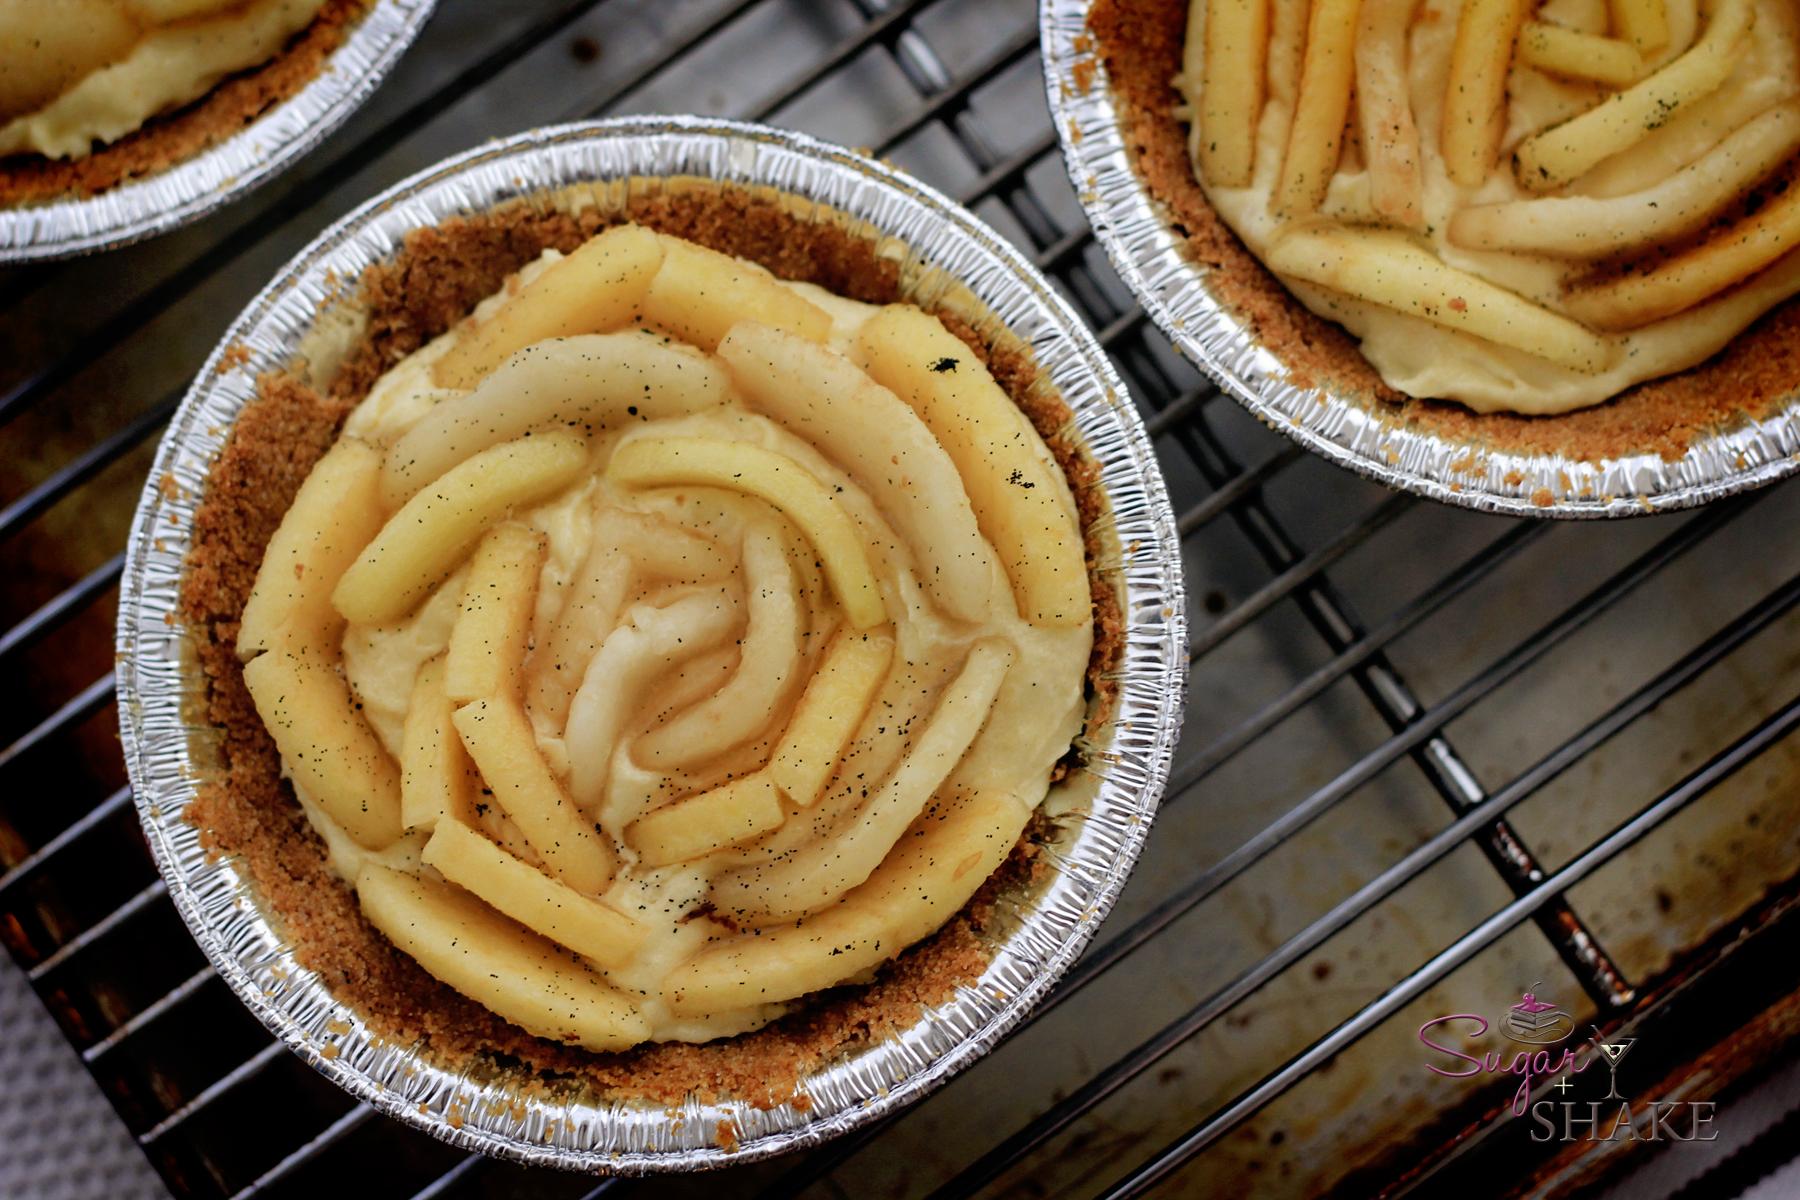 ... Photo — Apple & Pear Whiskey-Almond Custard Tart | Sugar + Shake